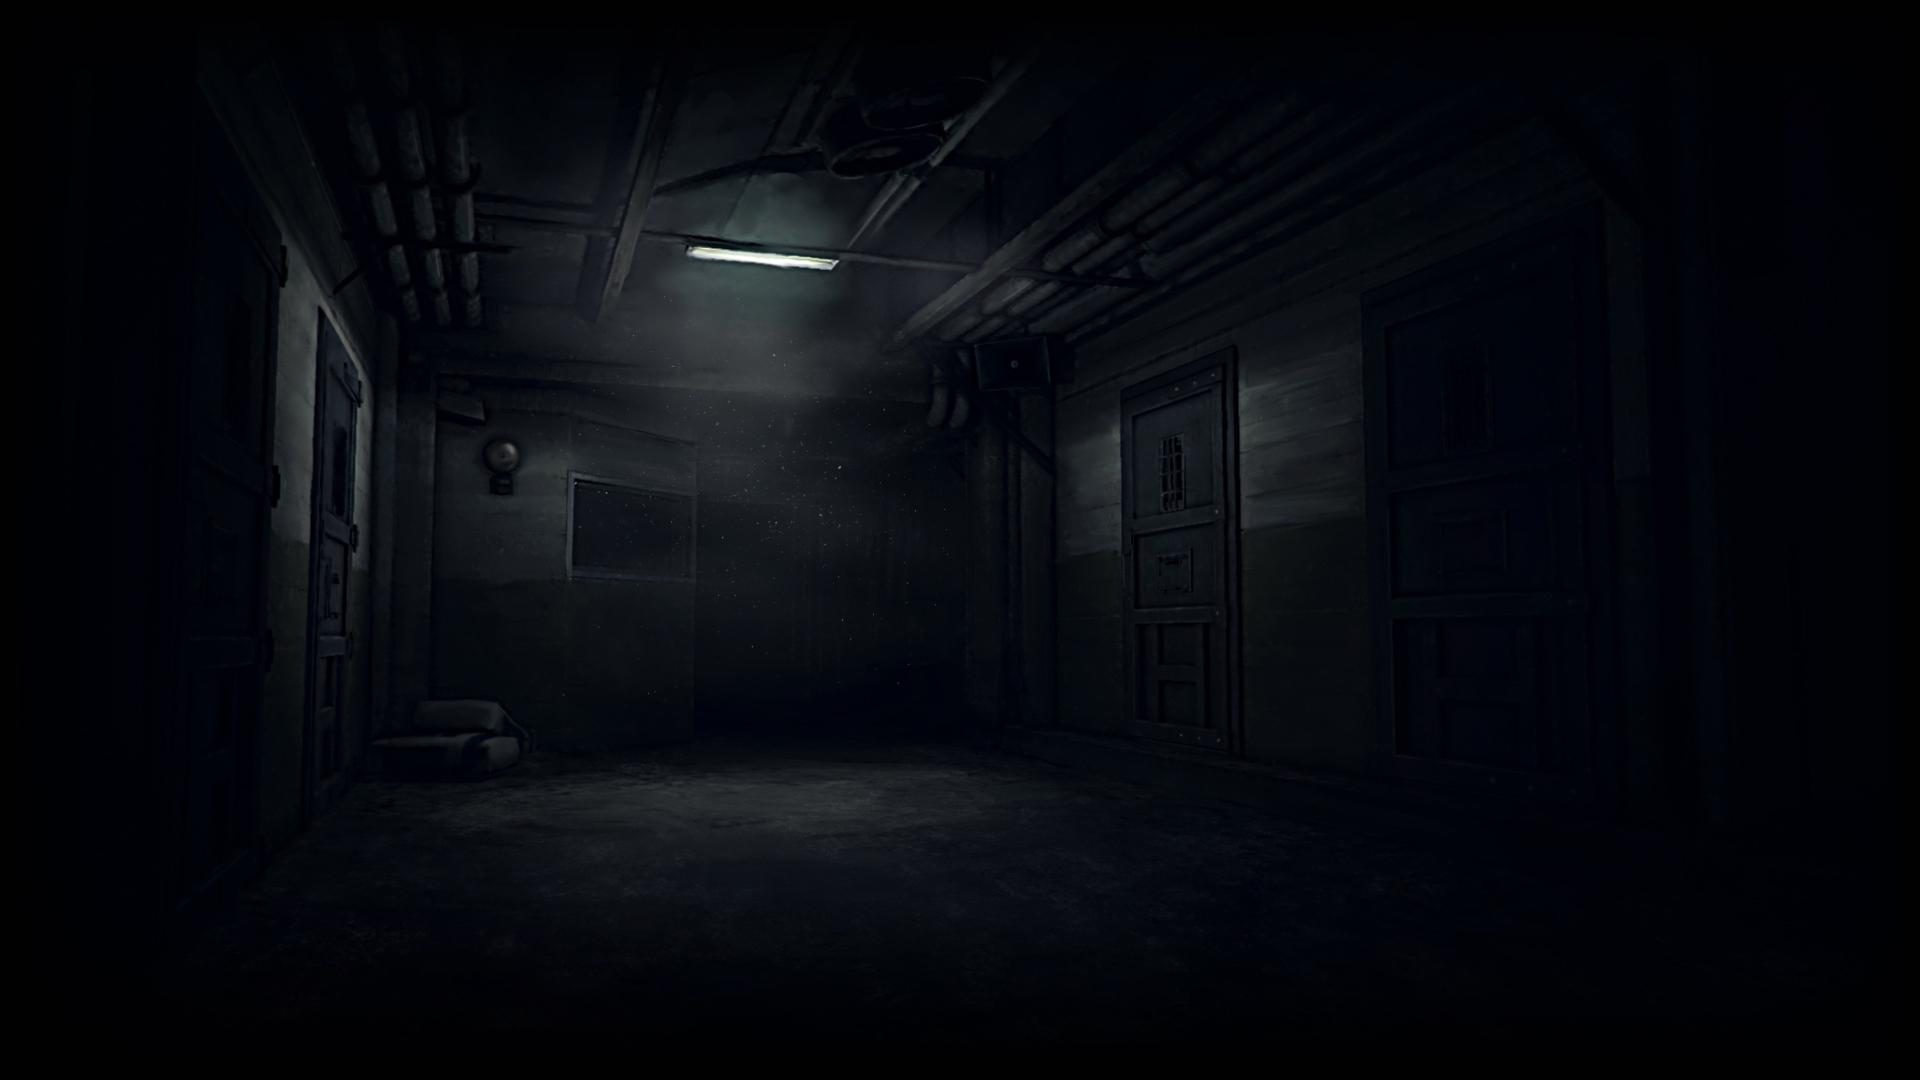 Scary woods photo edit - Image Hektor Background Dark Hallway Jpg Steam Trading